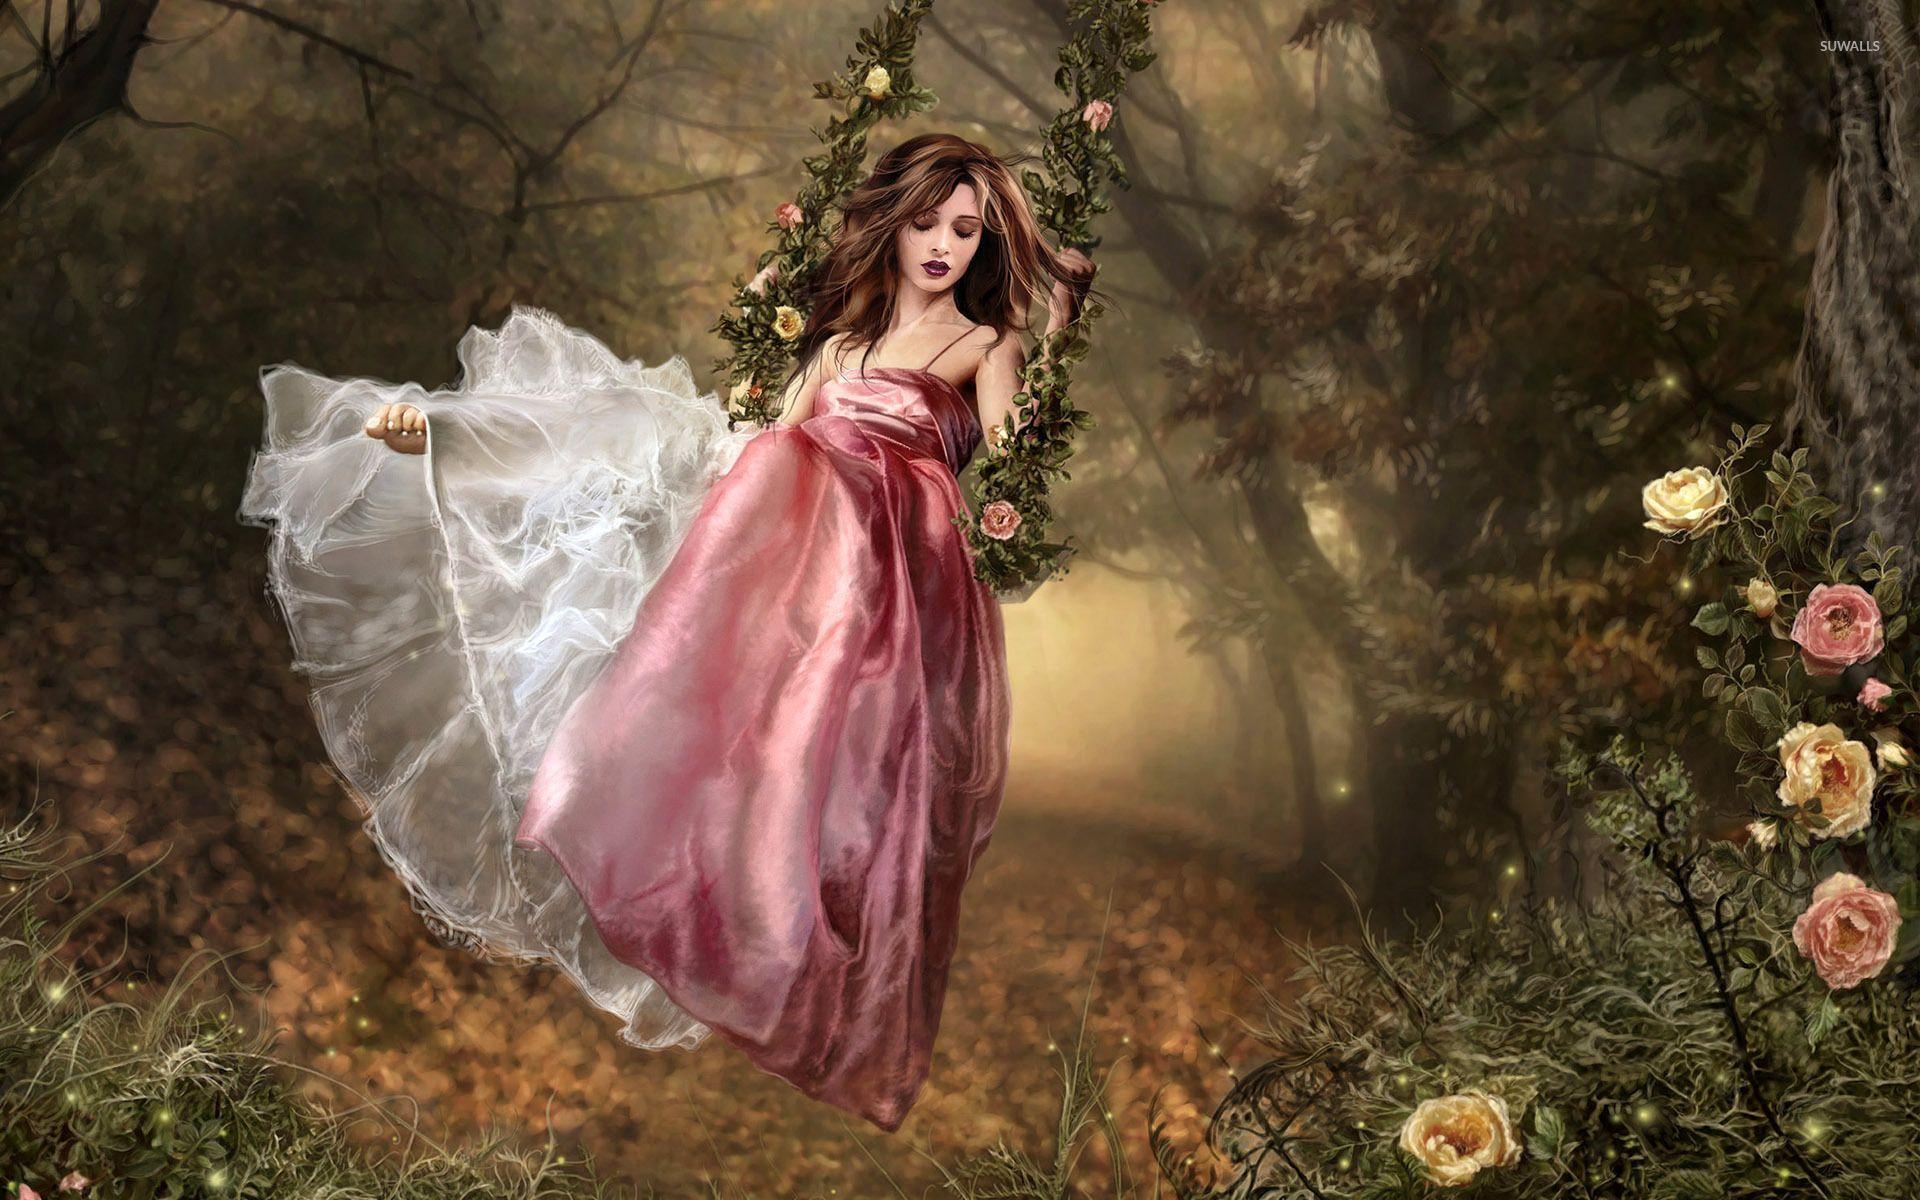 Girl on a swing wallpaper - Fantasy wallpapers - #4091